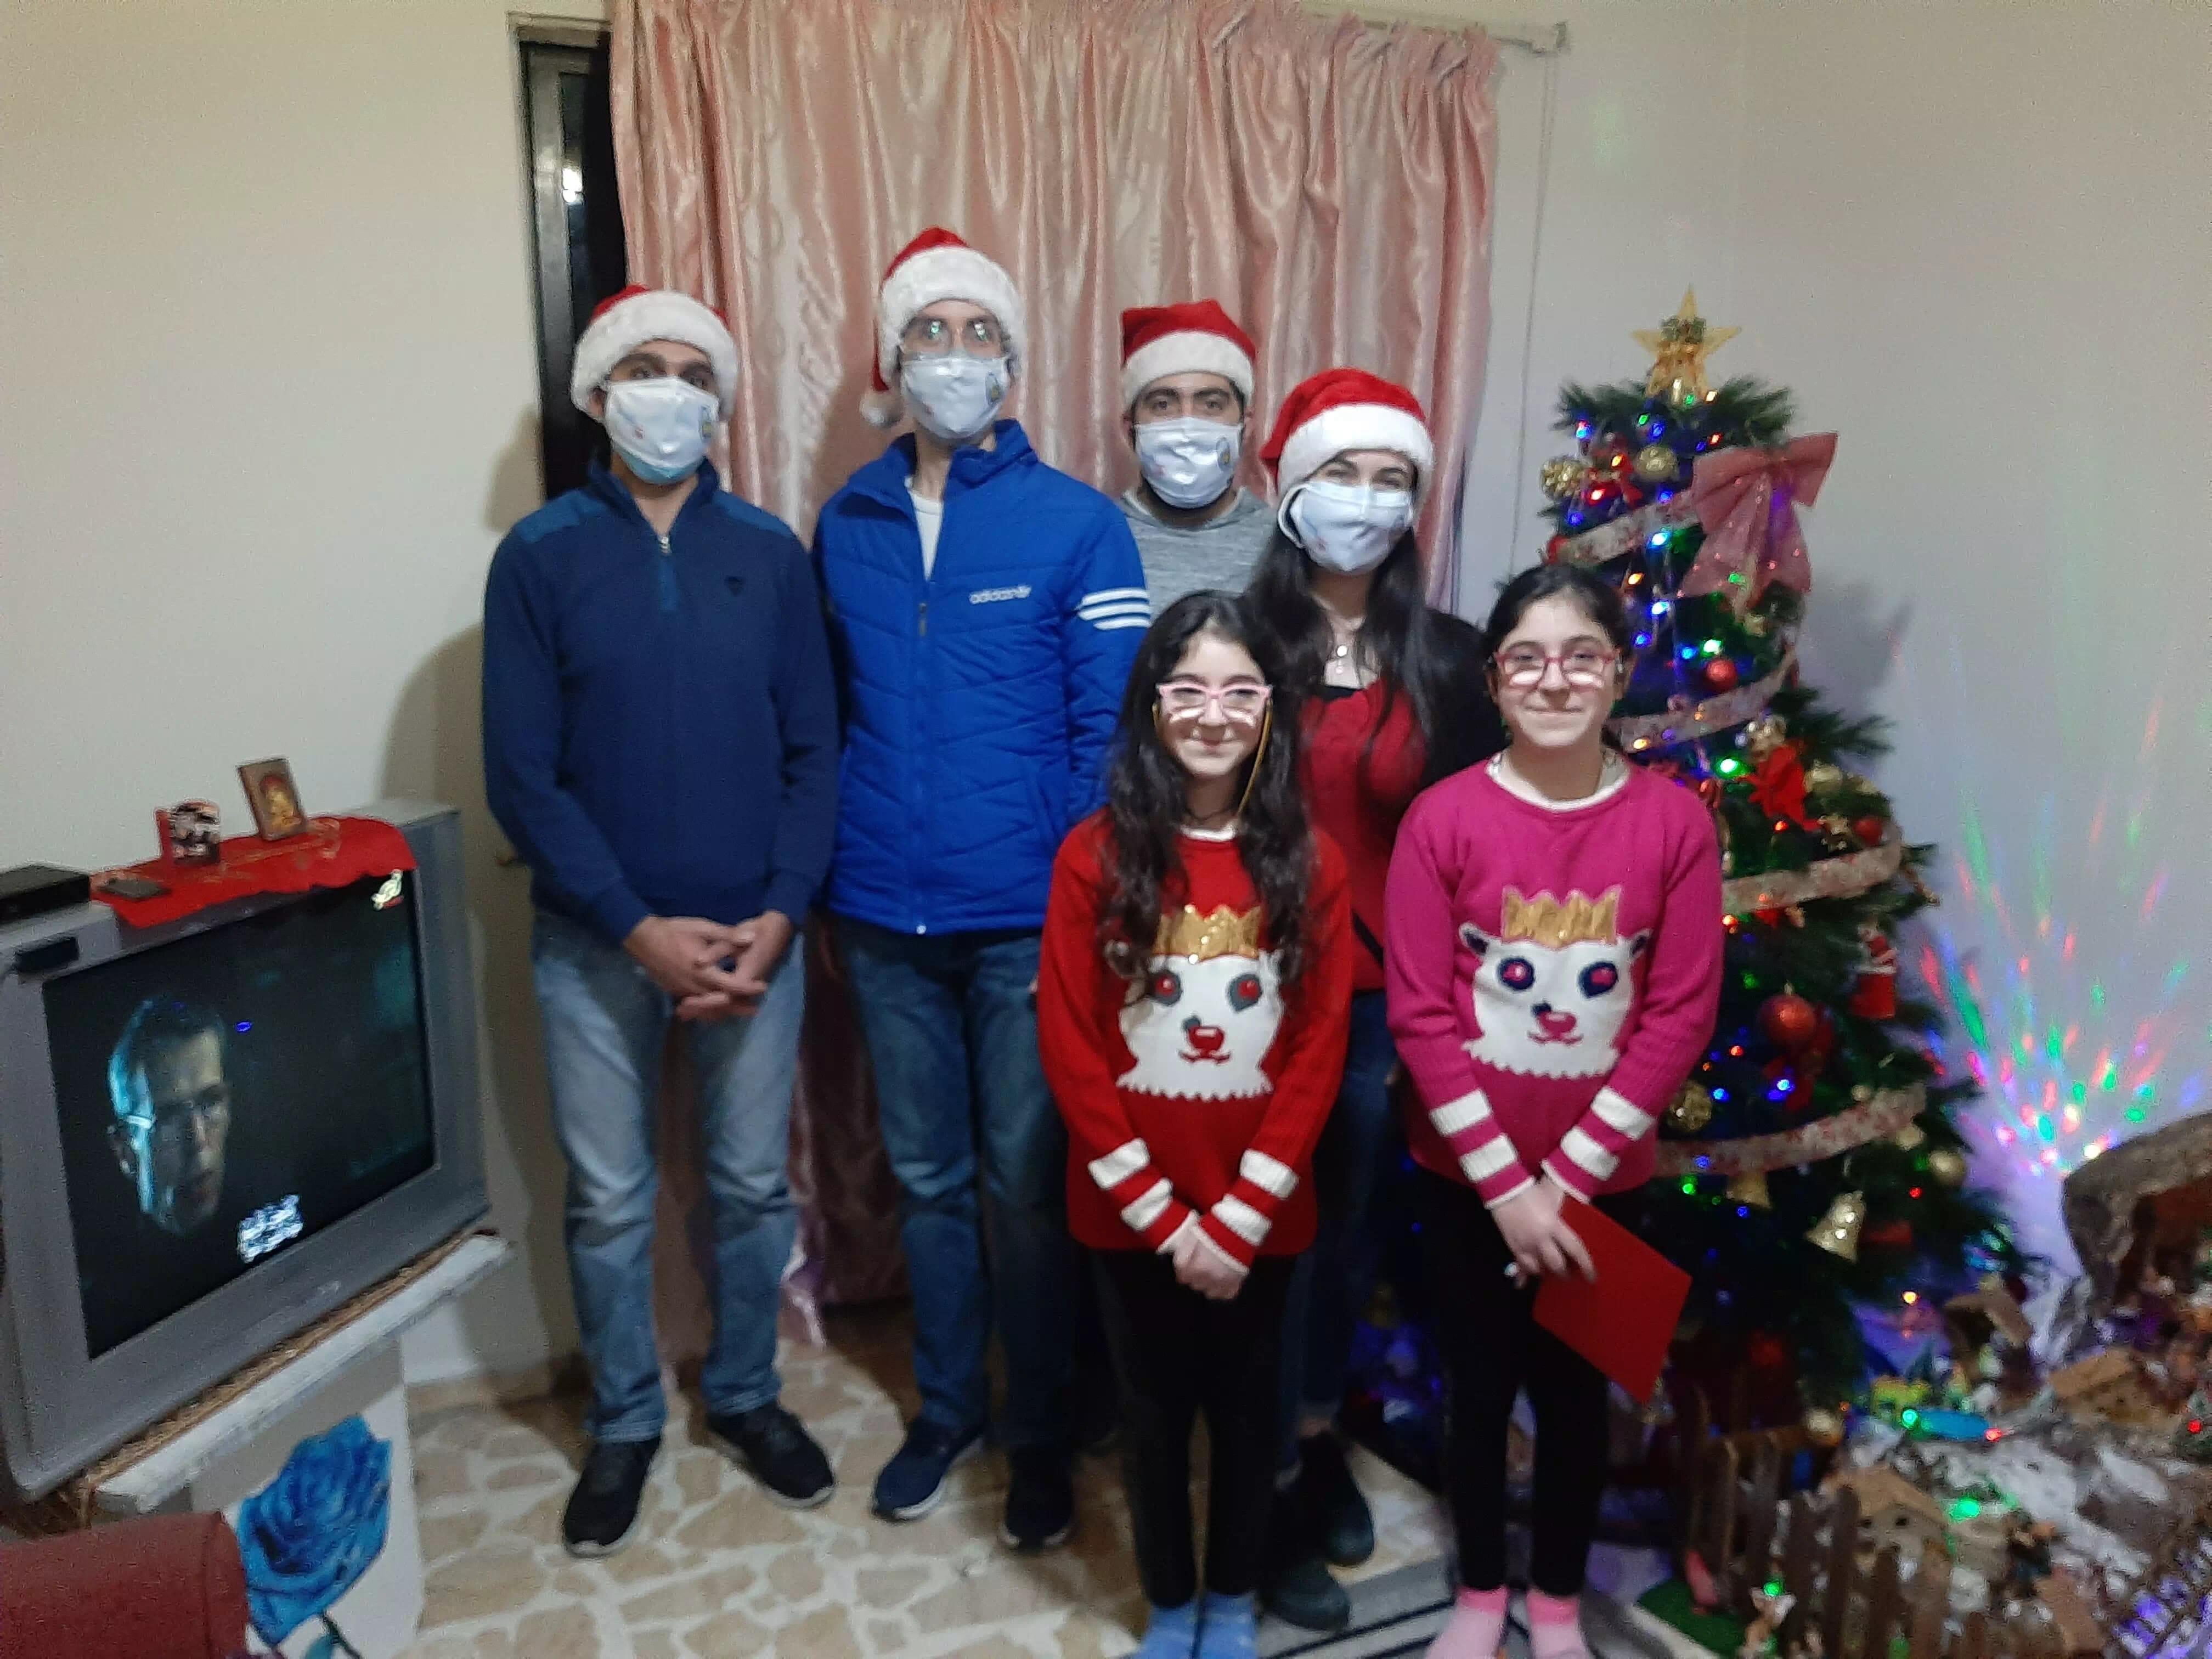 https://eundemia.sirv.com/Images/christmas/456818.webp